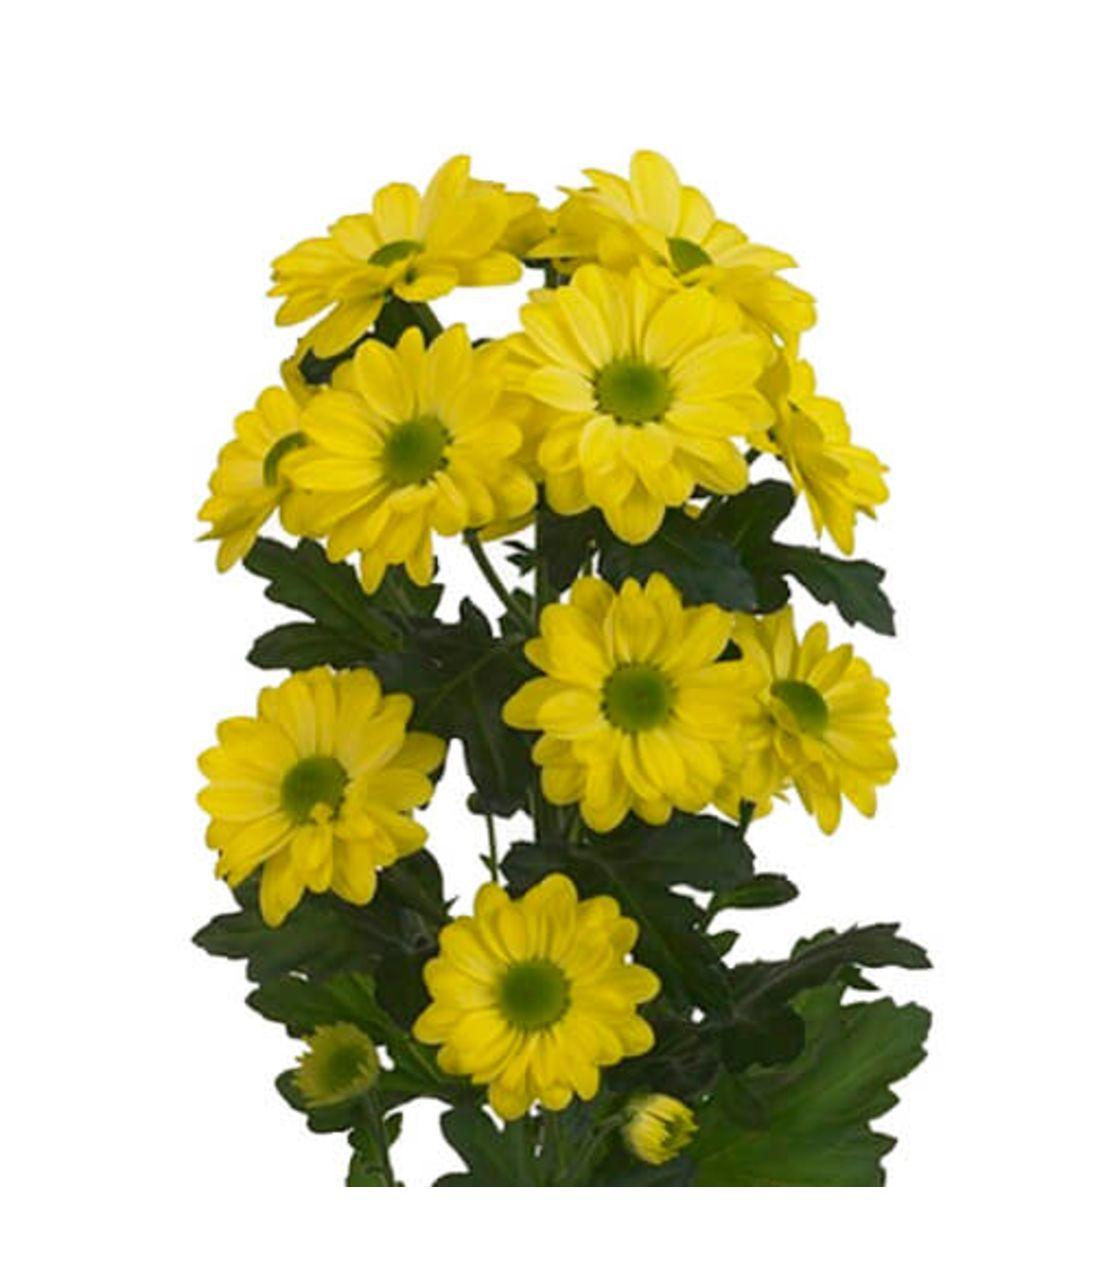 Хризантема желтая (ветка). Superflowers.com.ua